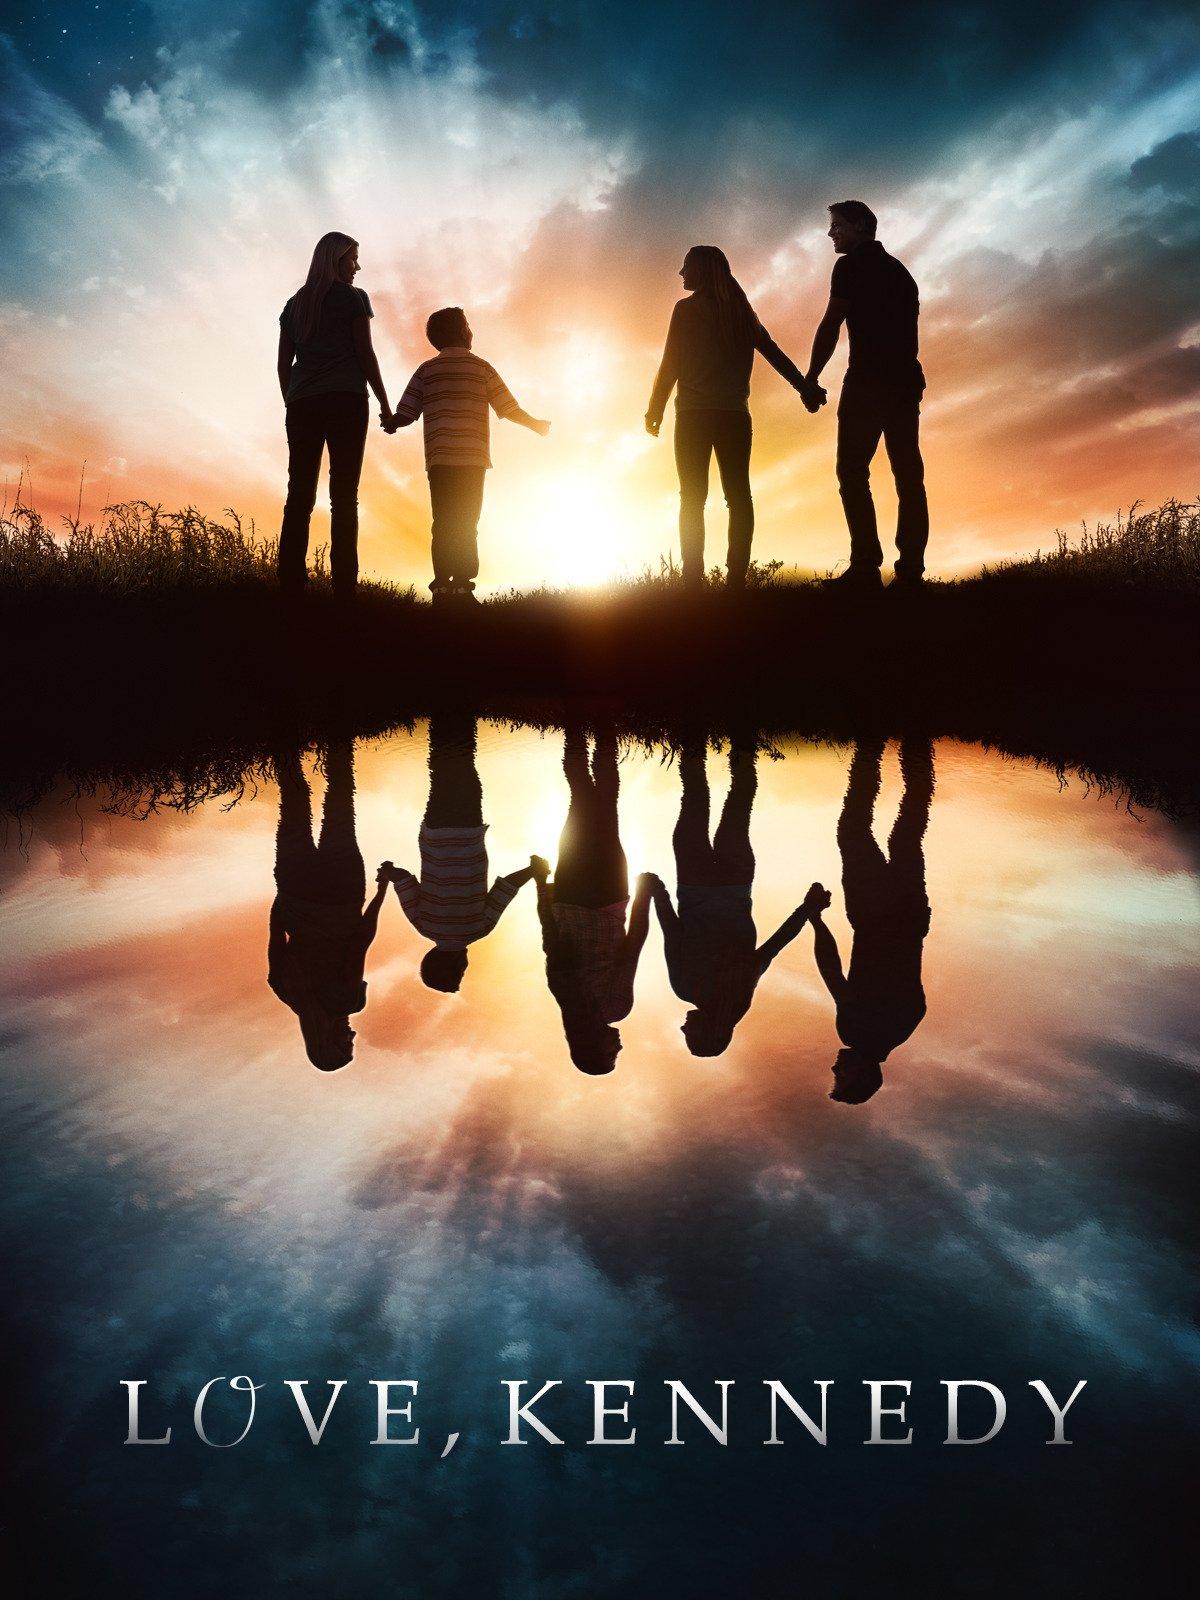 Love, Kennedy